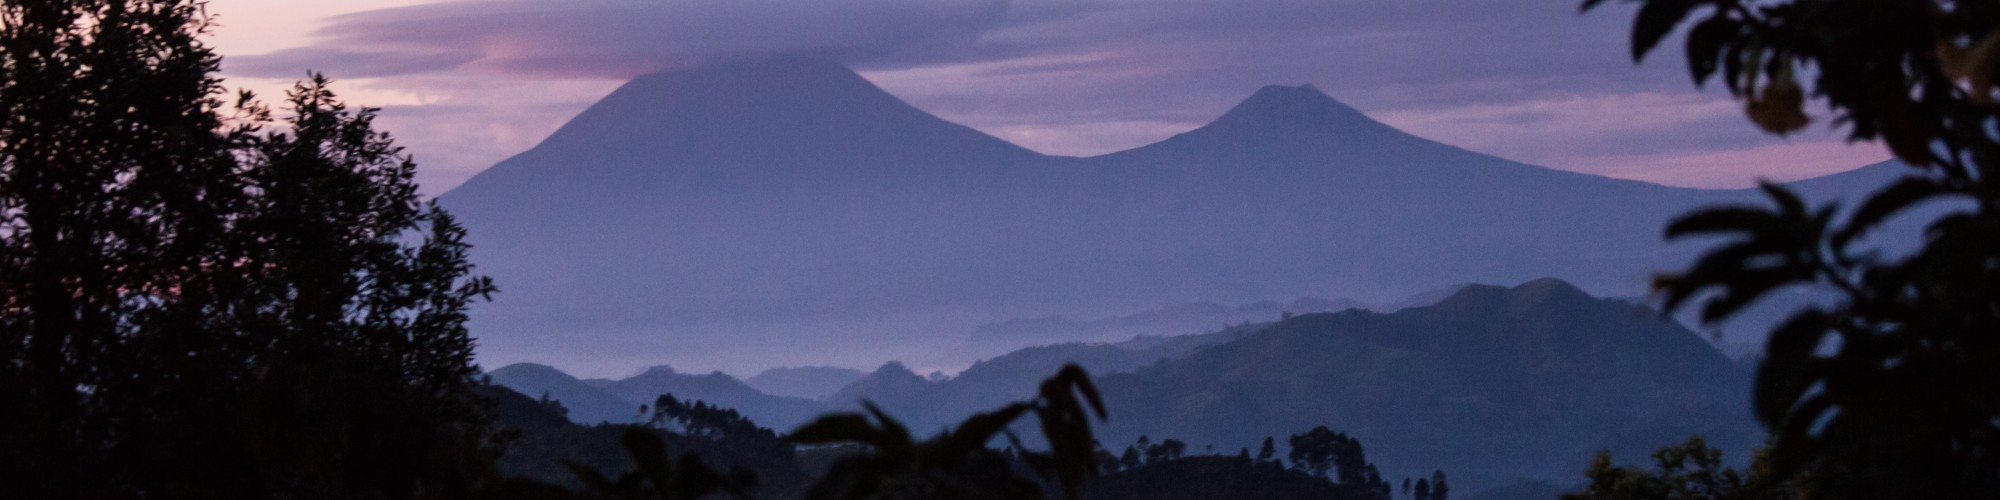 Clouds, Uganda